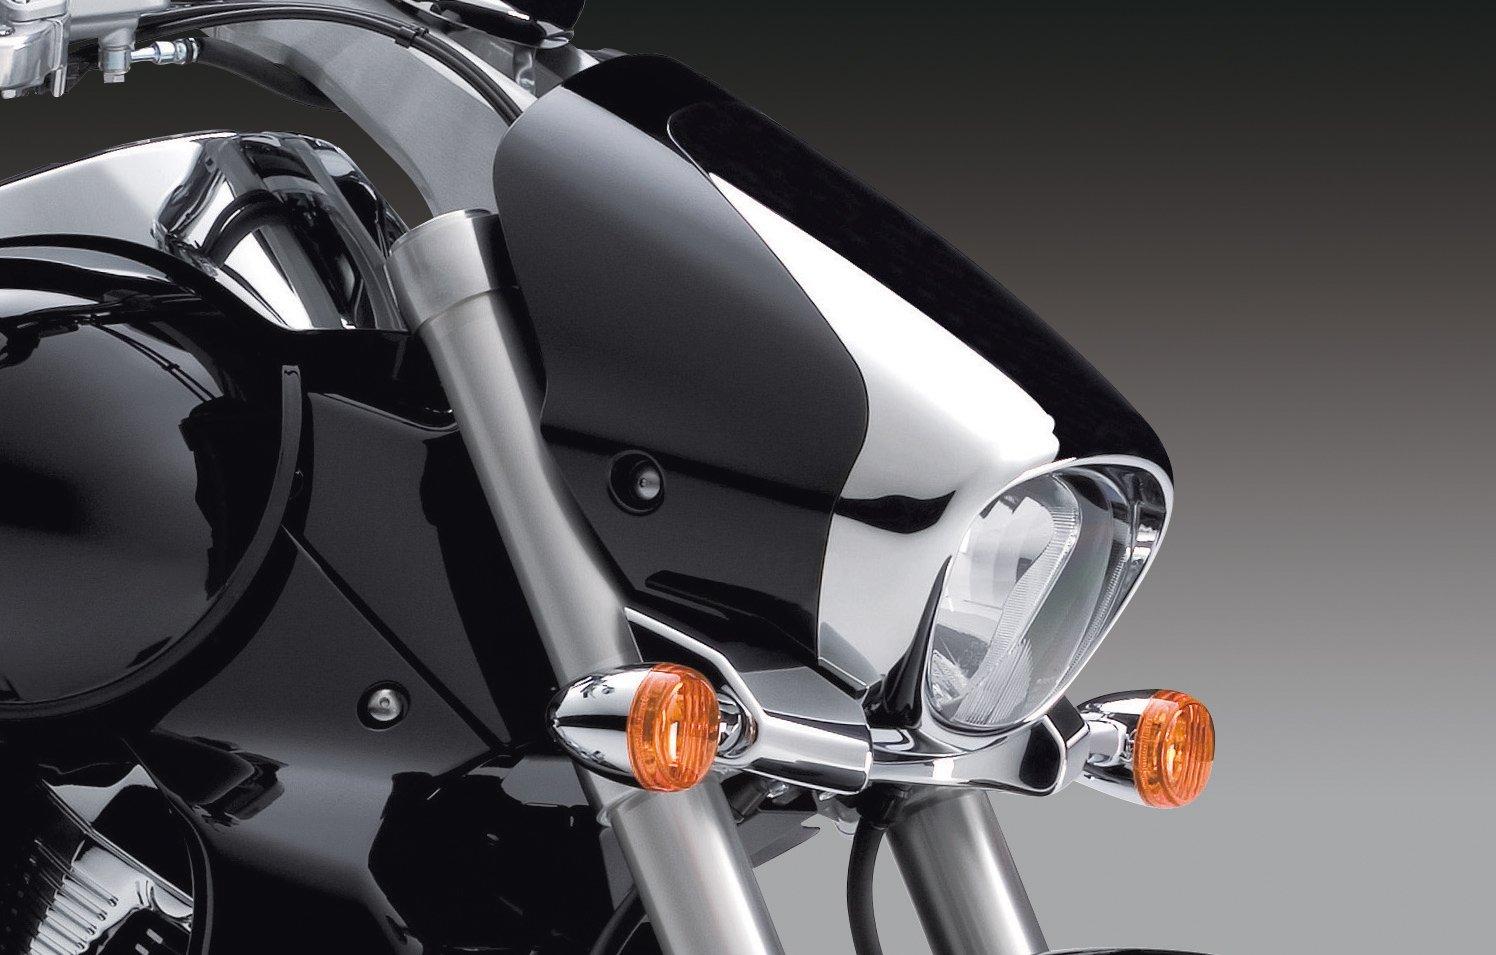 Suzuki Intruder M1800R большеобъемный круизер